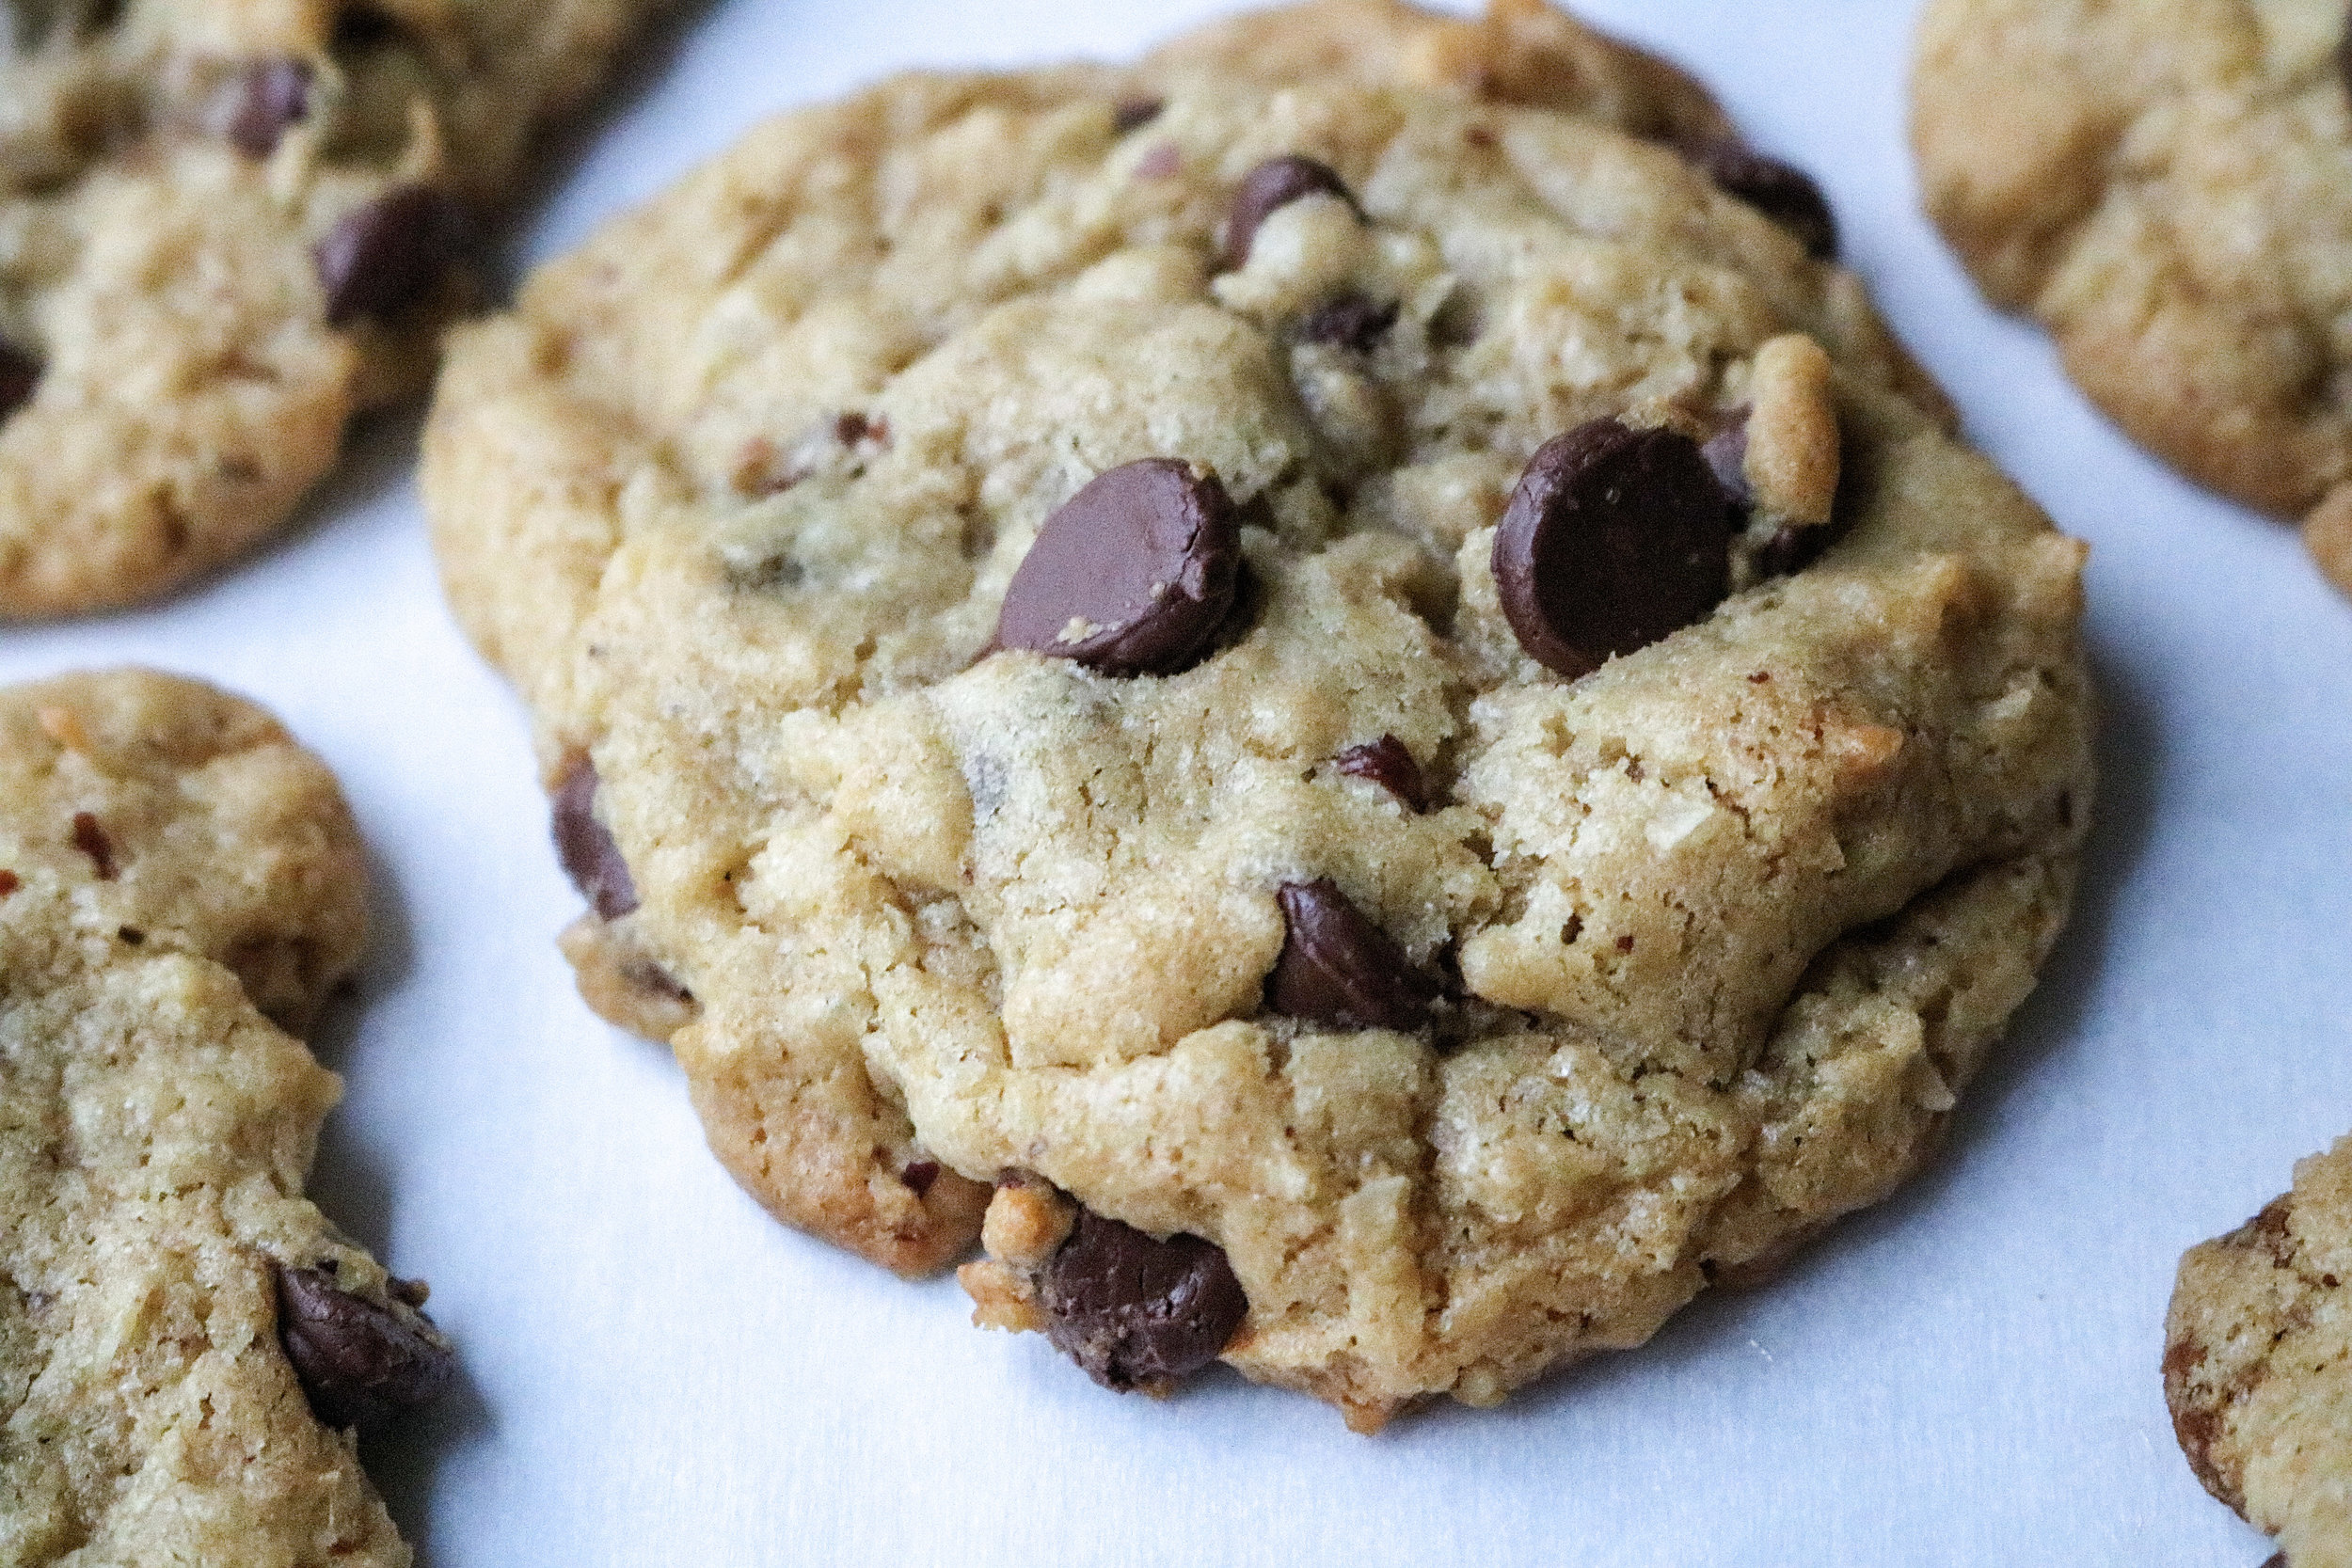 Gluten Free Coconut Chocolate Chip Cookies